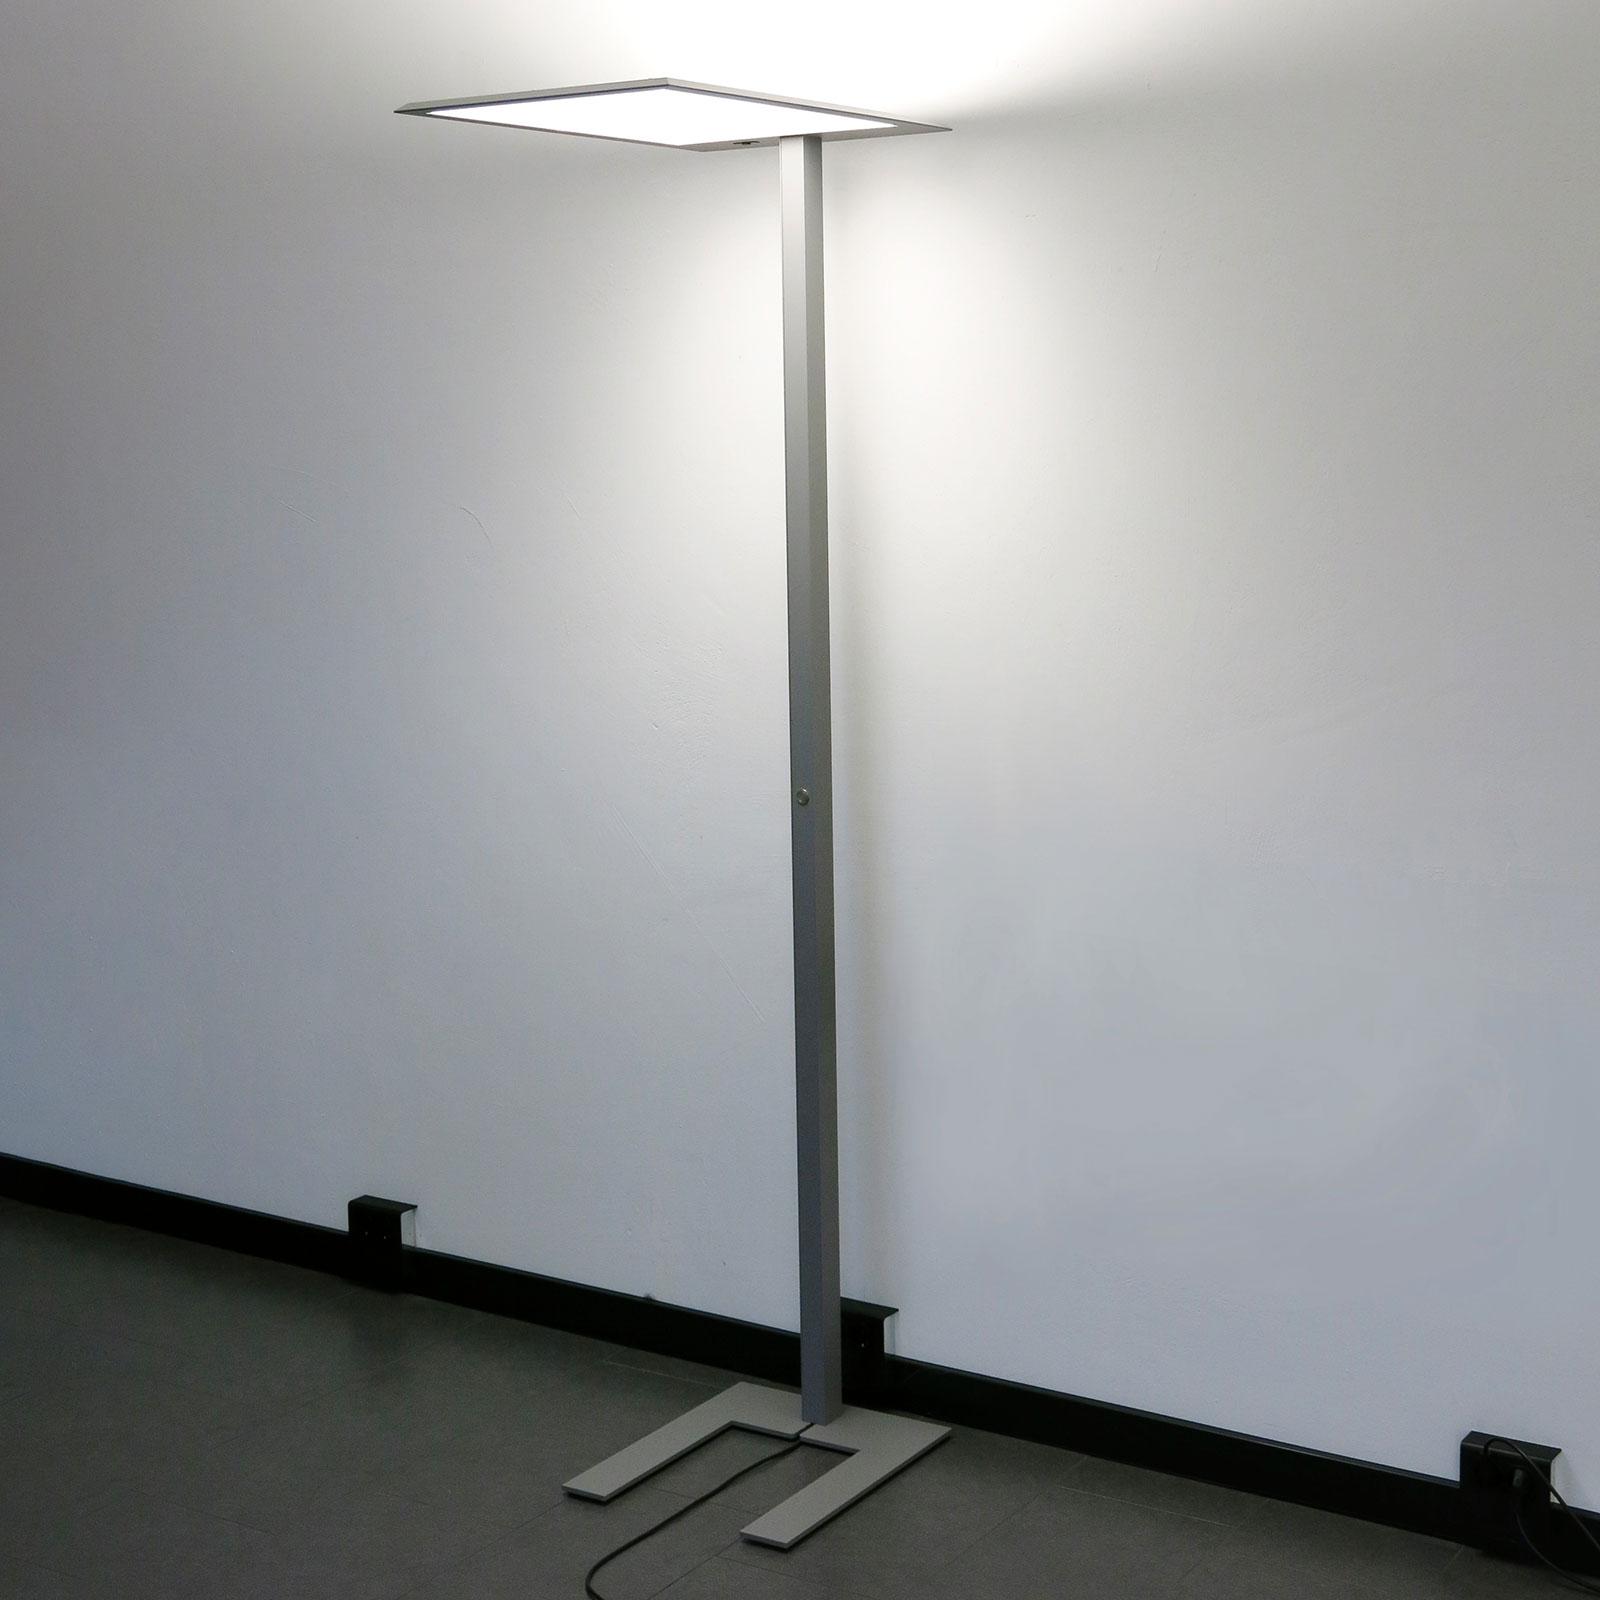 LED-Stehleuchte LEAS, 203 cm, titan, Sensor